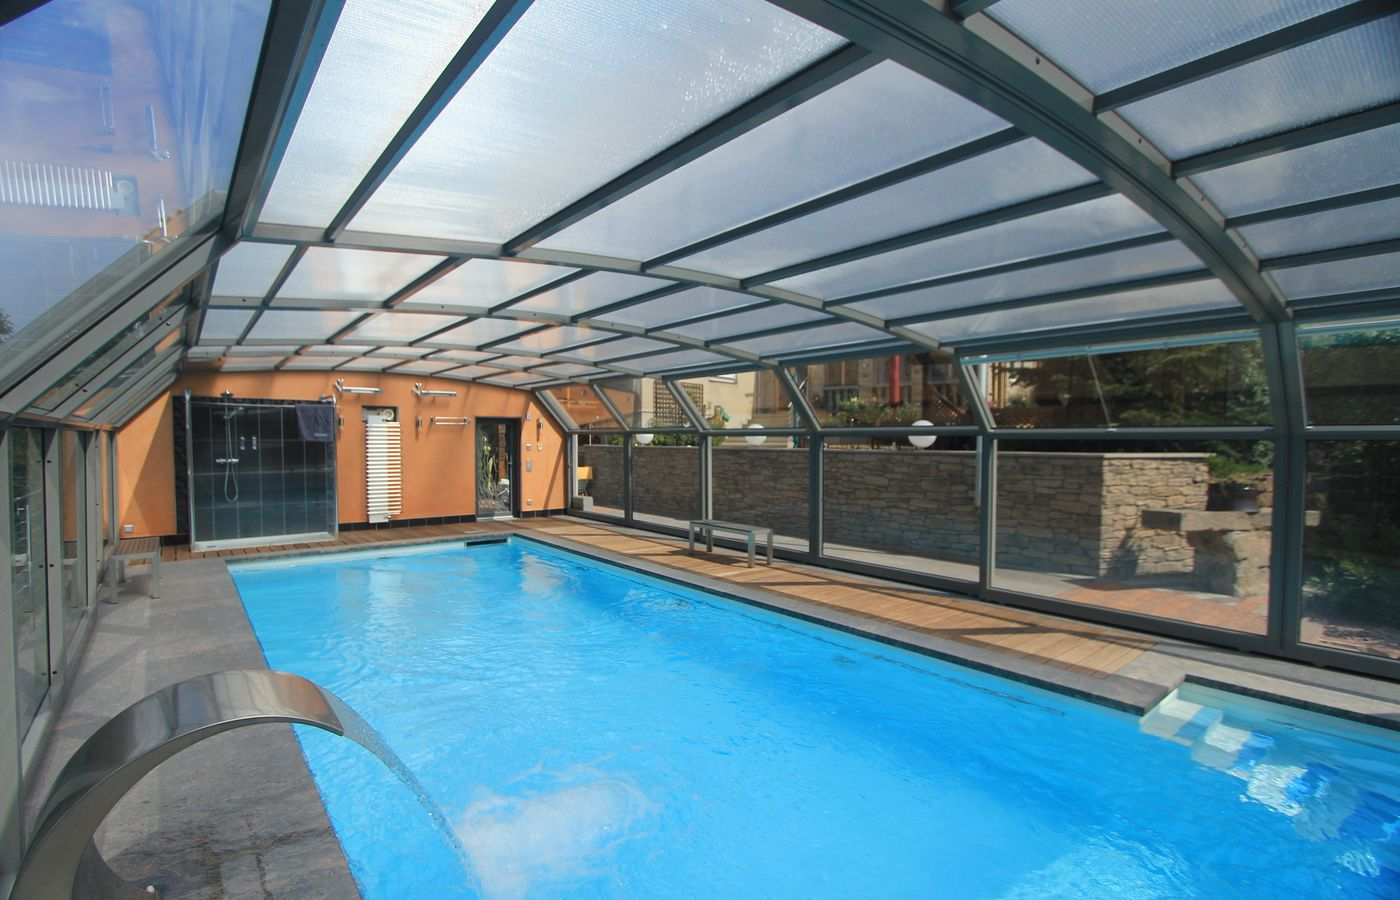 Cobertura de piscina alucober 17 alucober coberturas for Cobertura piscina